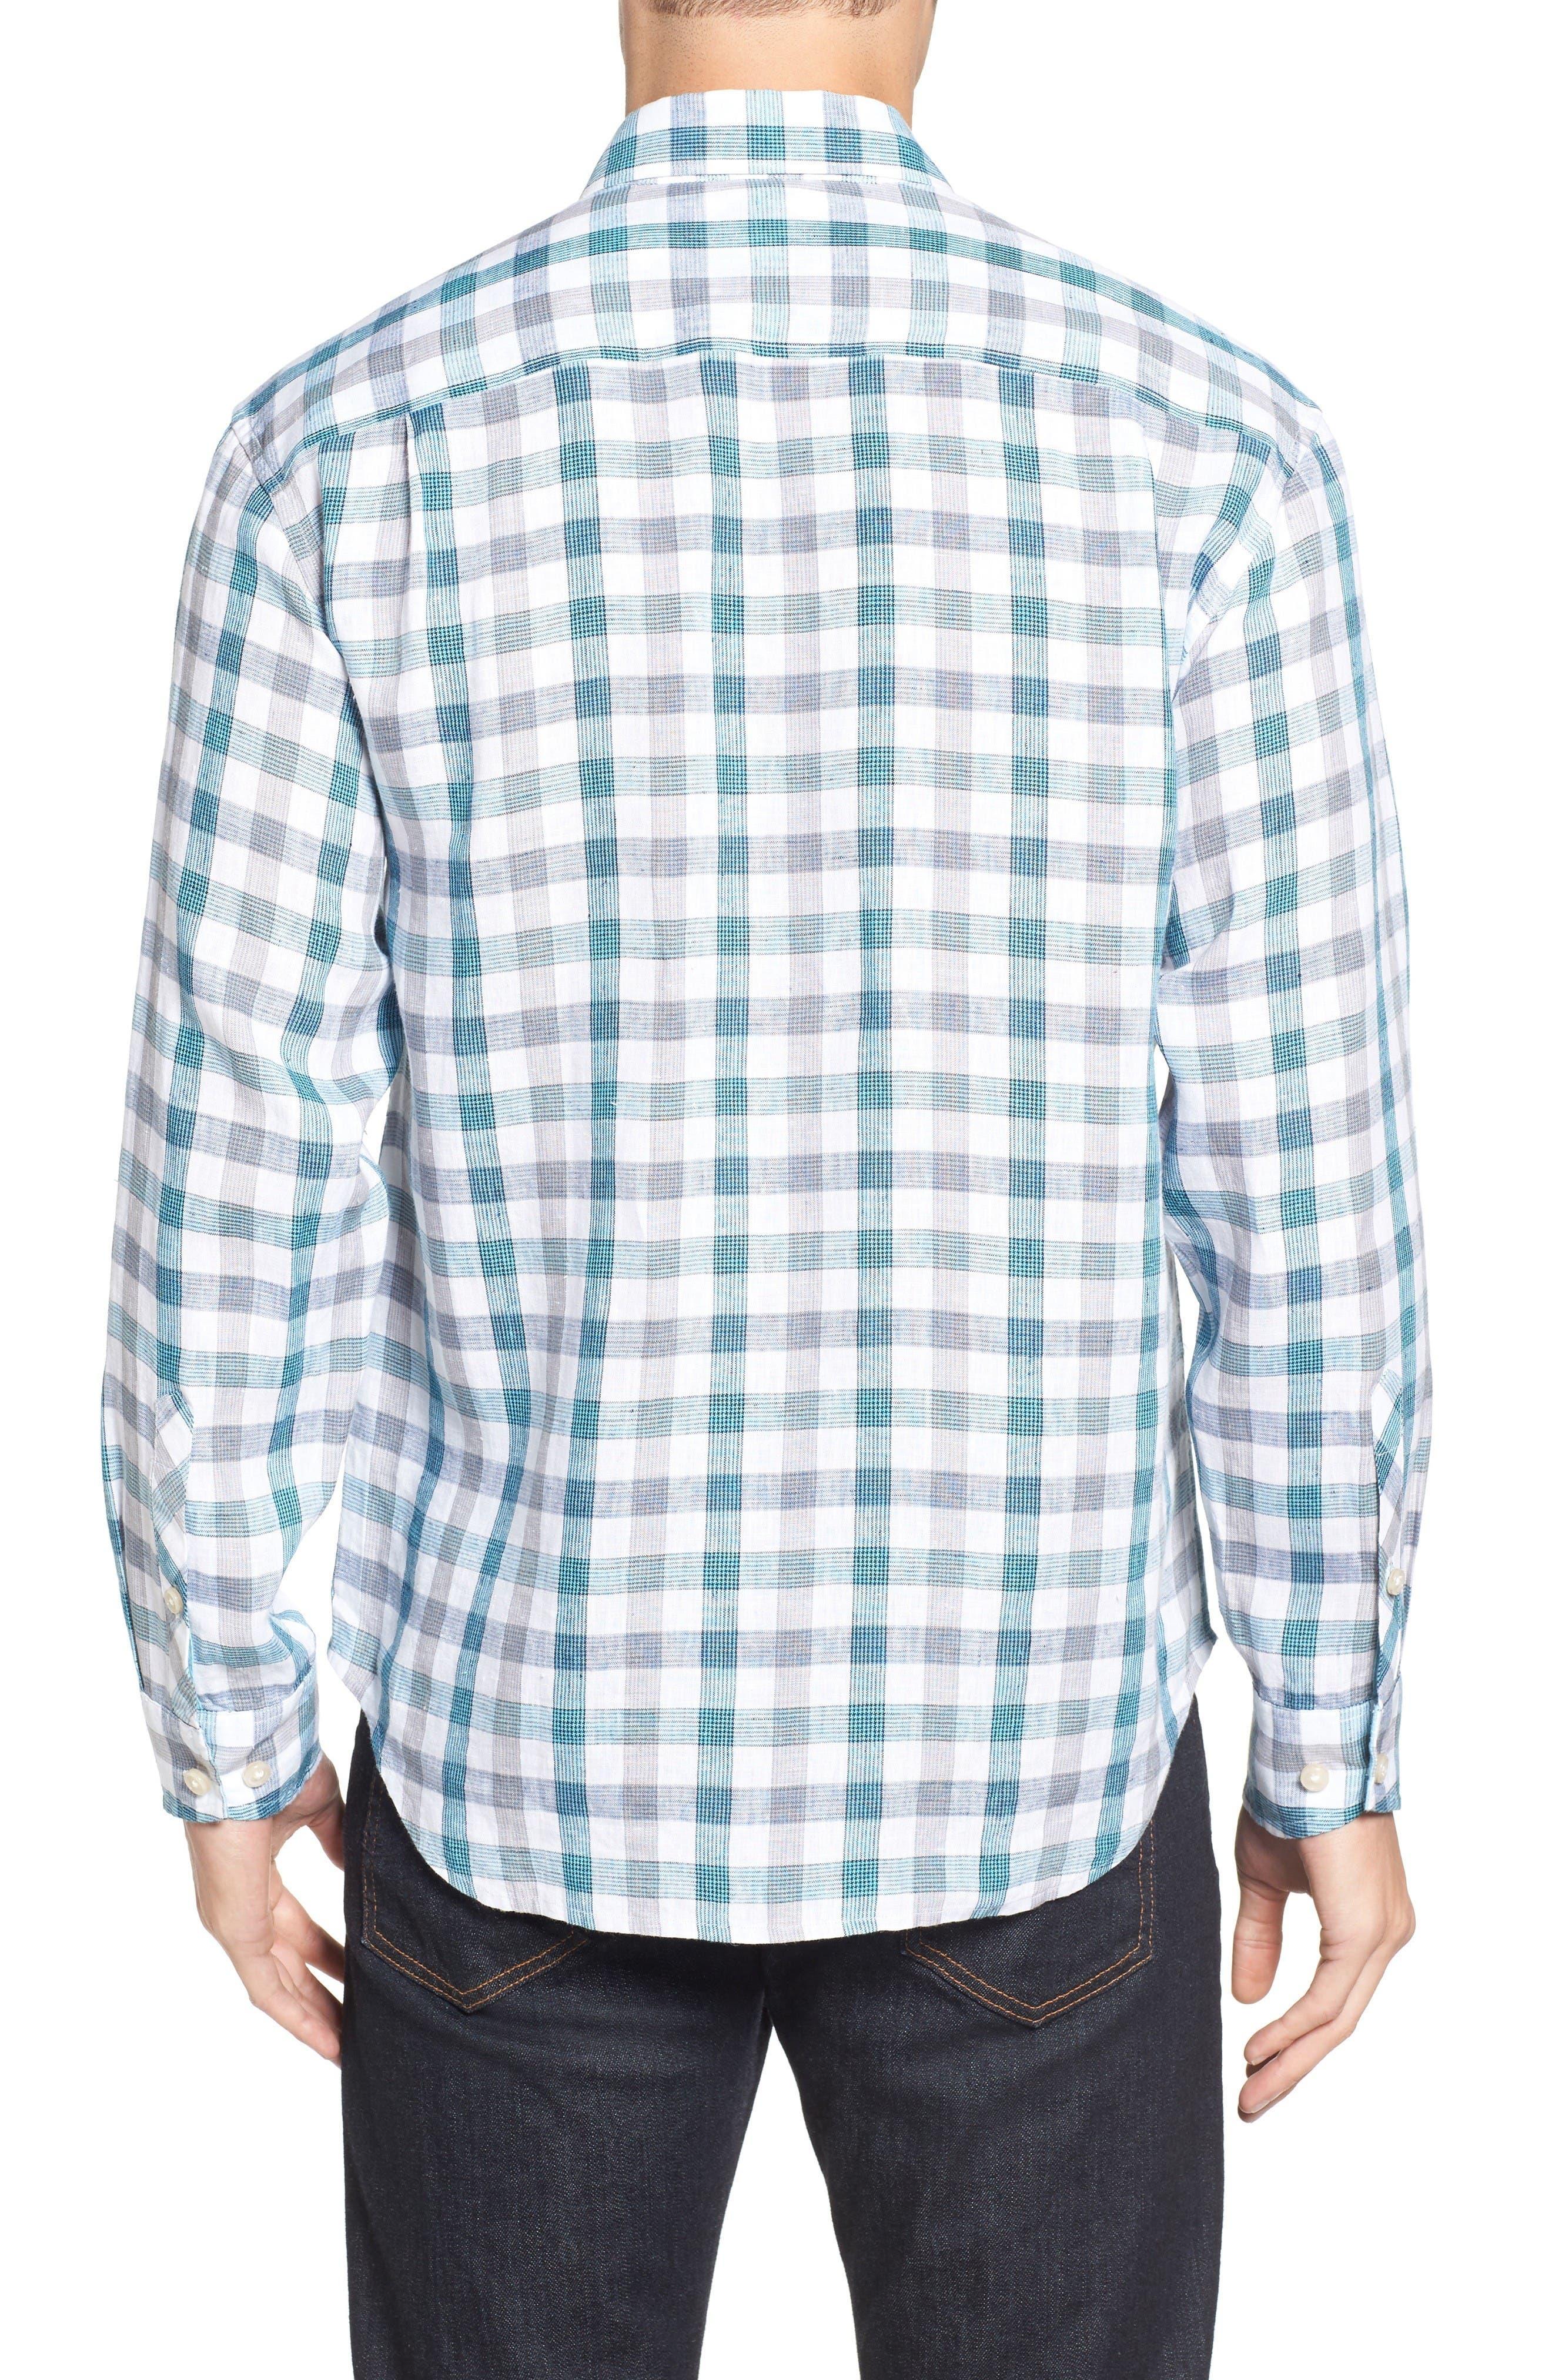 Thira Check Linen Sport Shirt,                             Alternate thumbnail 2, color,                             Download Blue